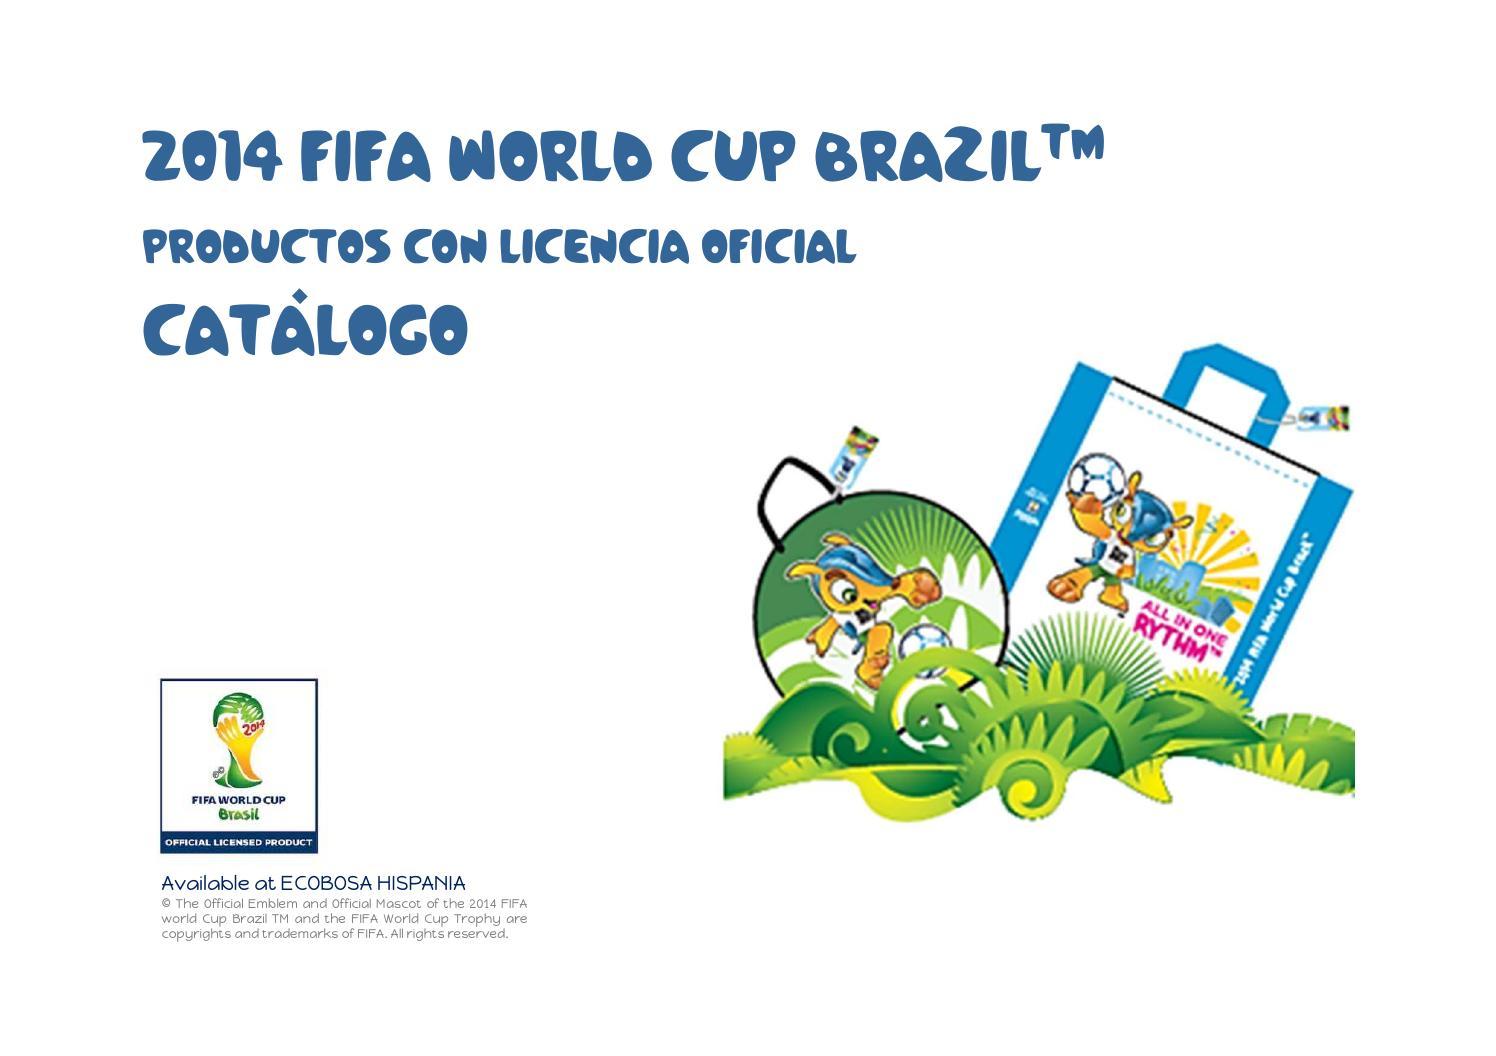 06470d4c8 Productos con Licencia Oficial by Ecobolsa Hispania - issuu